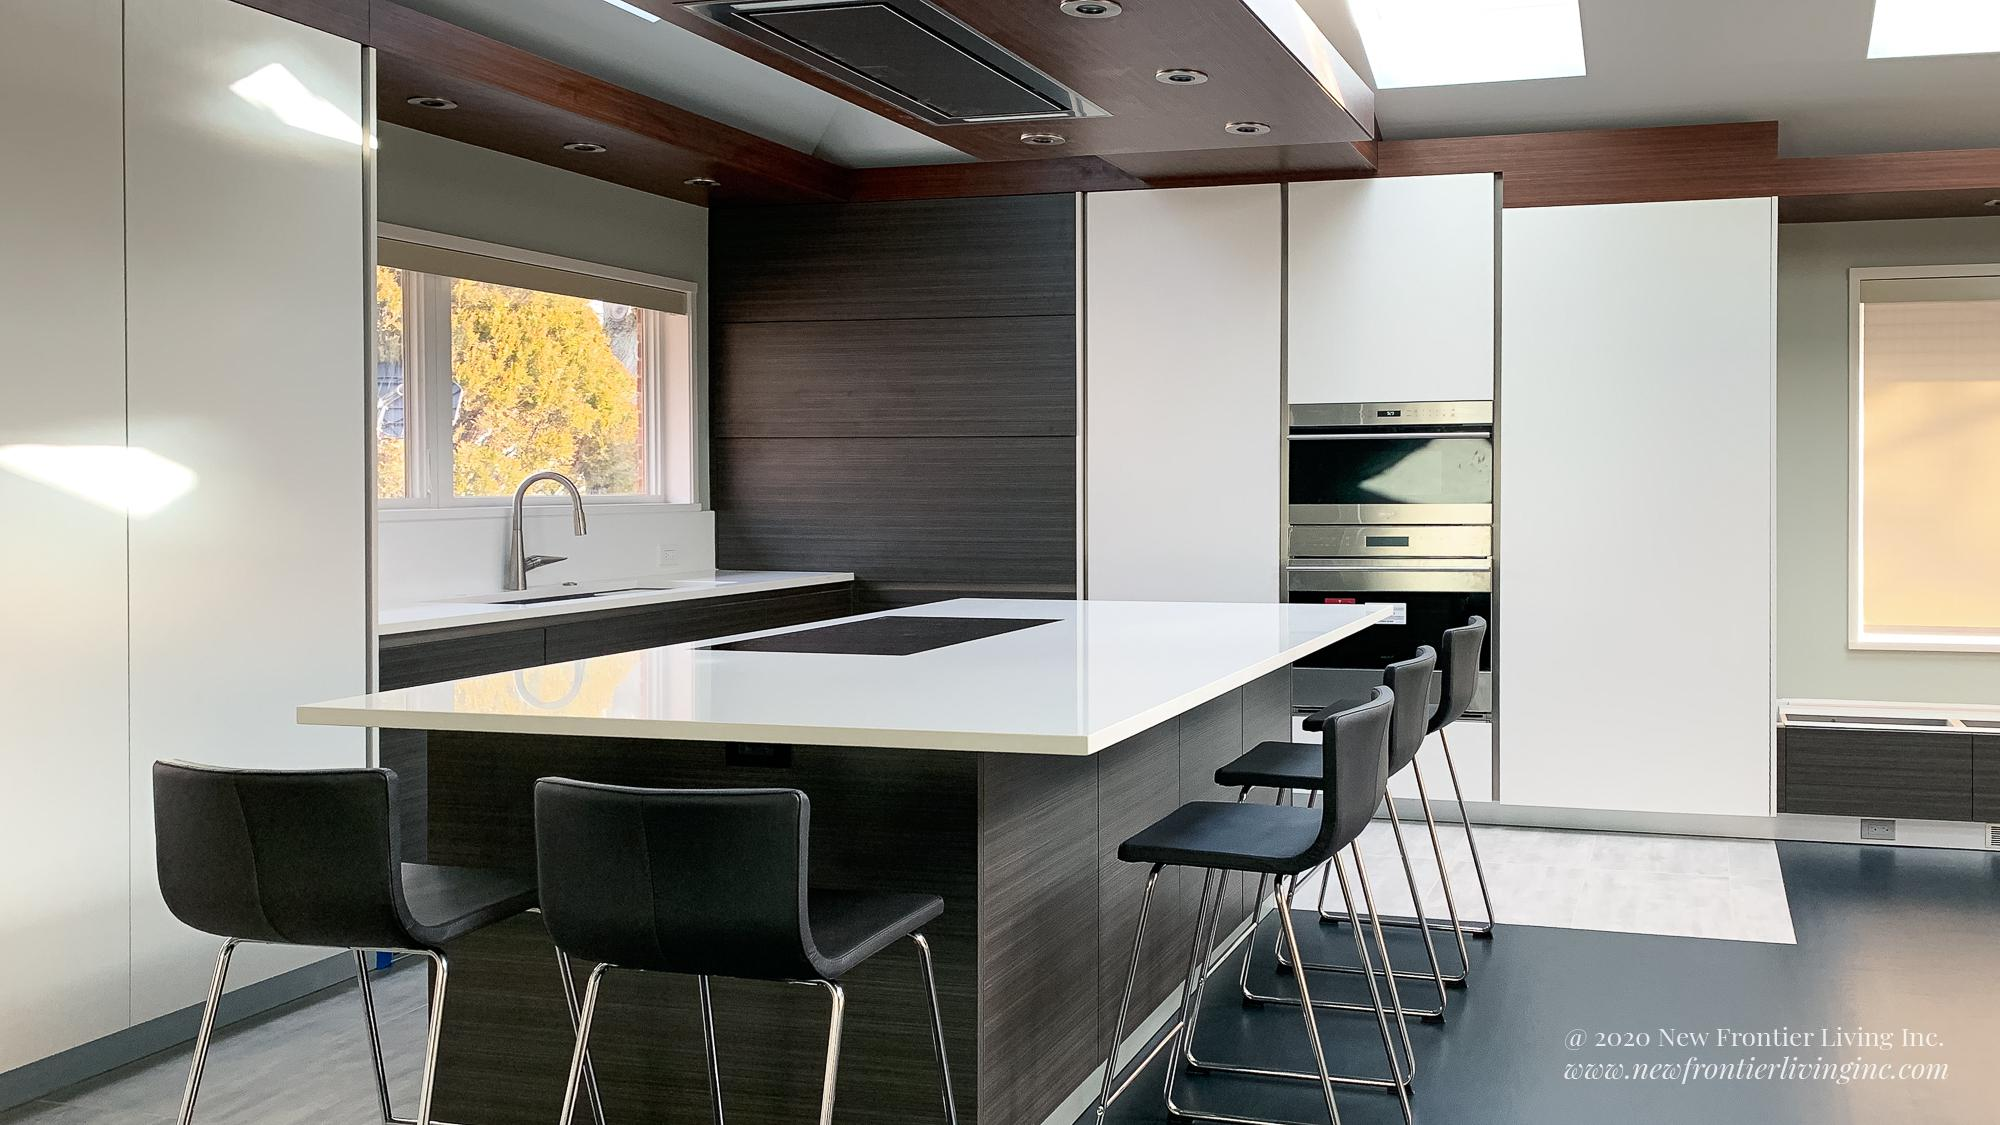 Dark gray and white kitchen with white quartz countertop on a kitchen island